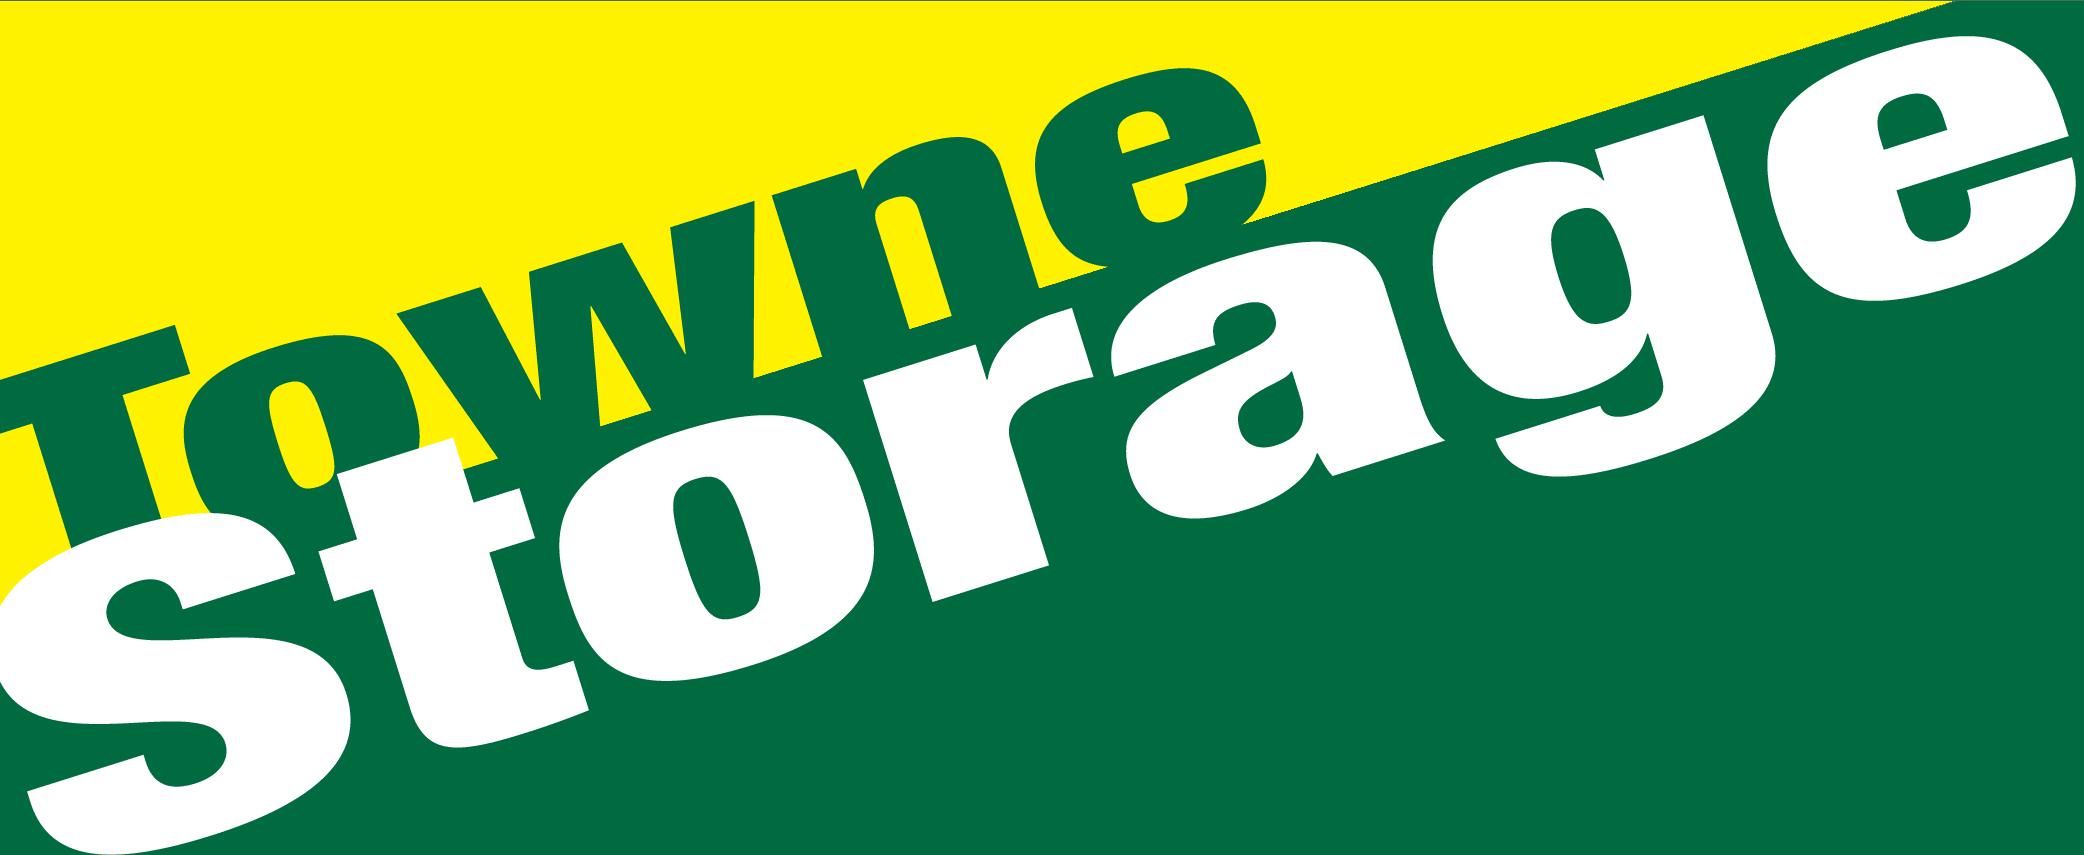 Towne Storage - St. George logo